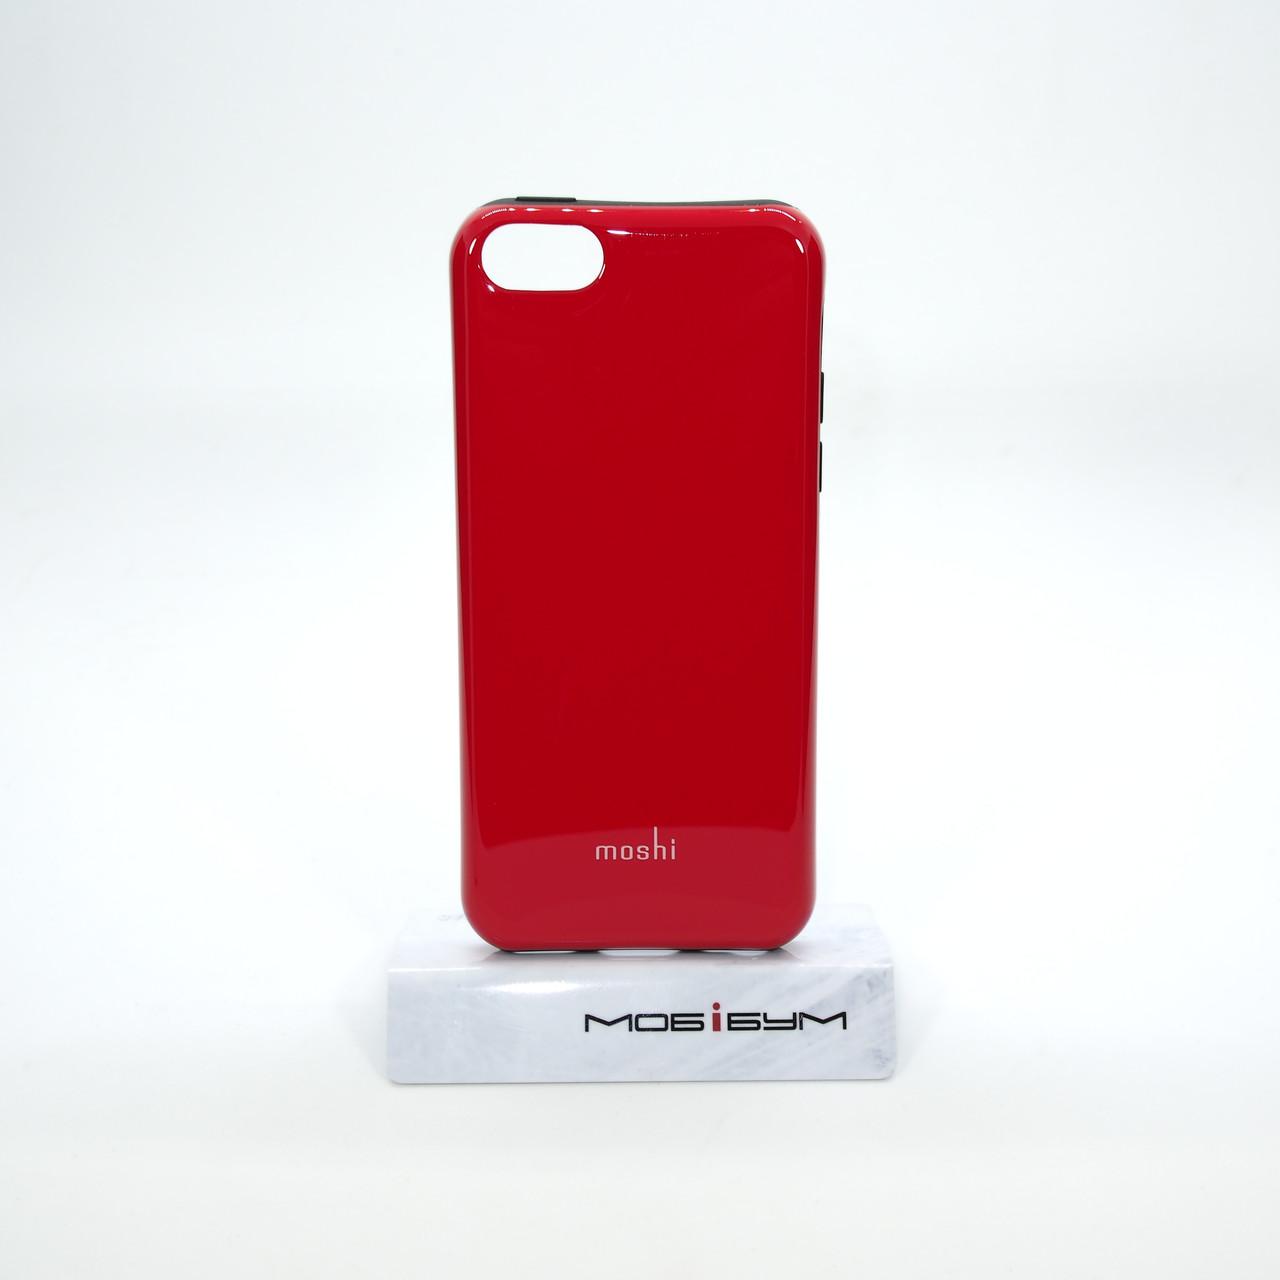 Чехол Moshi iGlaze Remix iPhone 5c Corse red (99MO069321) EAN/UPC: 4712052315822